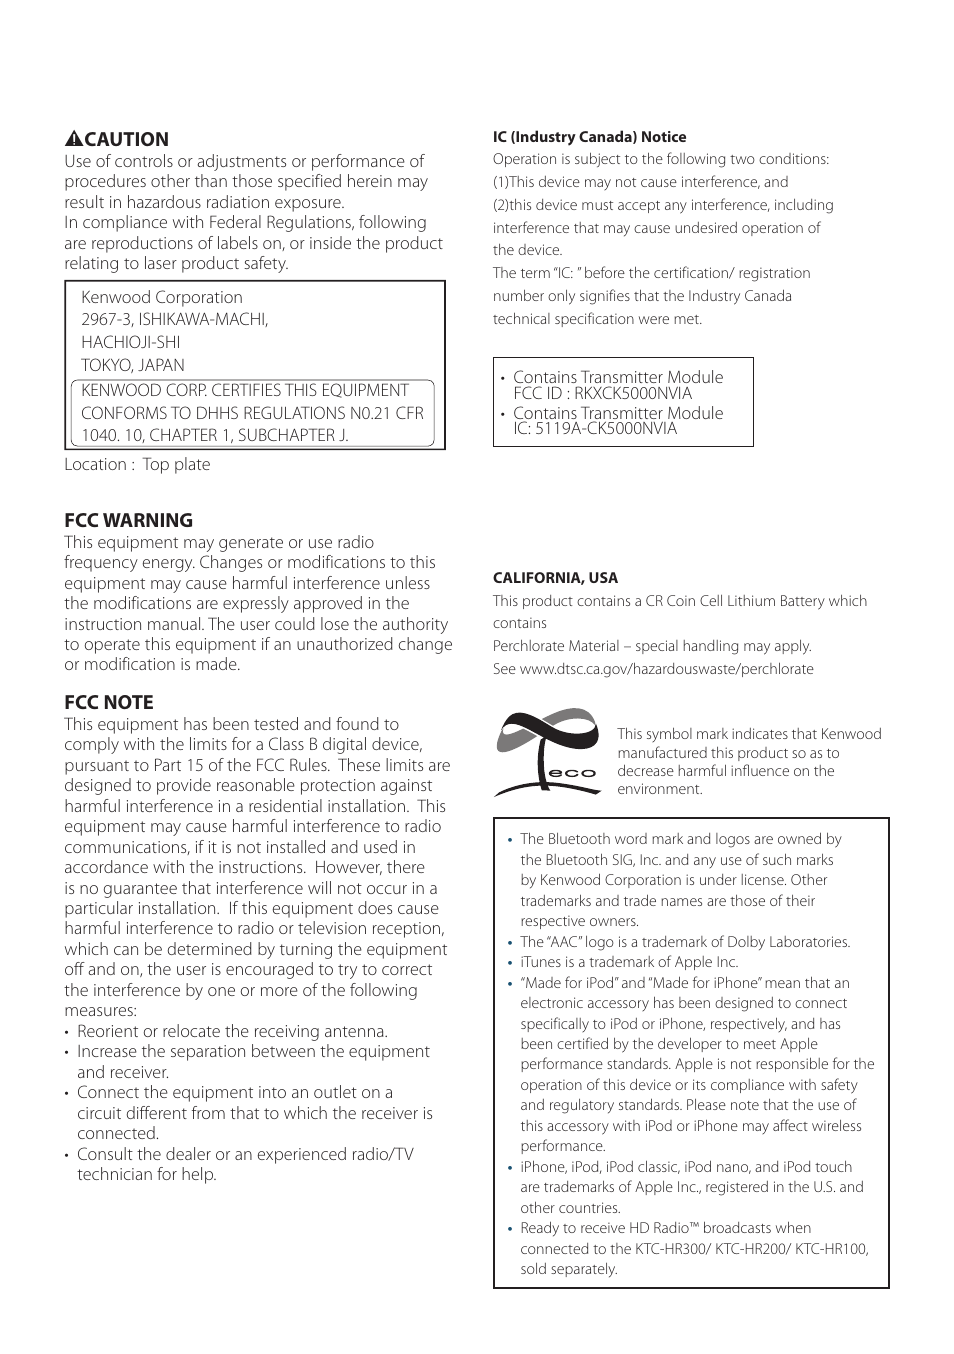 kenwood kdc 448u user manual page 71 71 original mode also rh manualsdir com Kenwood eXcelon KDC -X693 Kenwood eXcelon KDC -X693